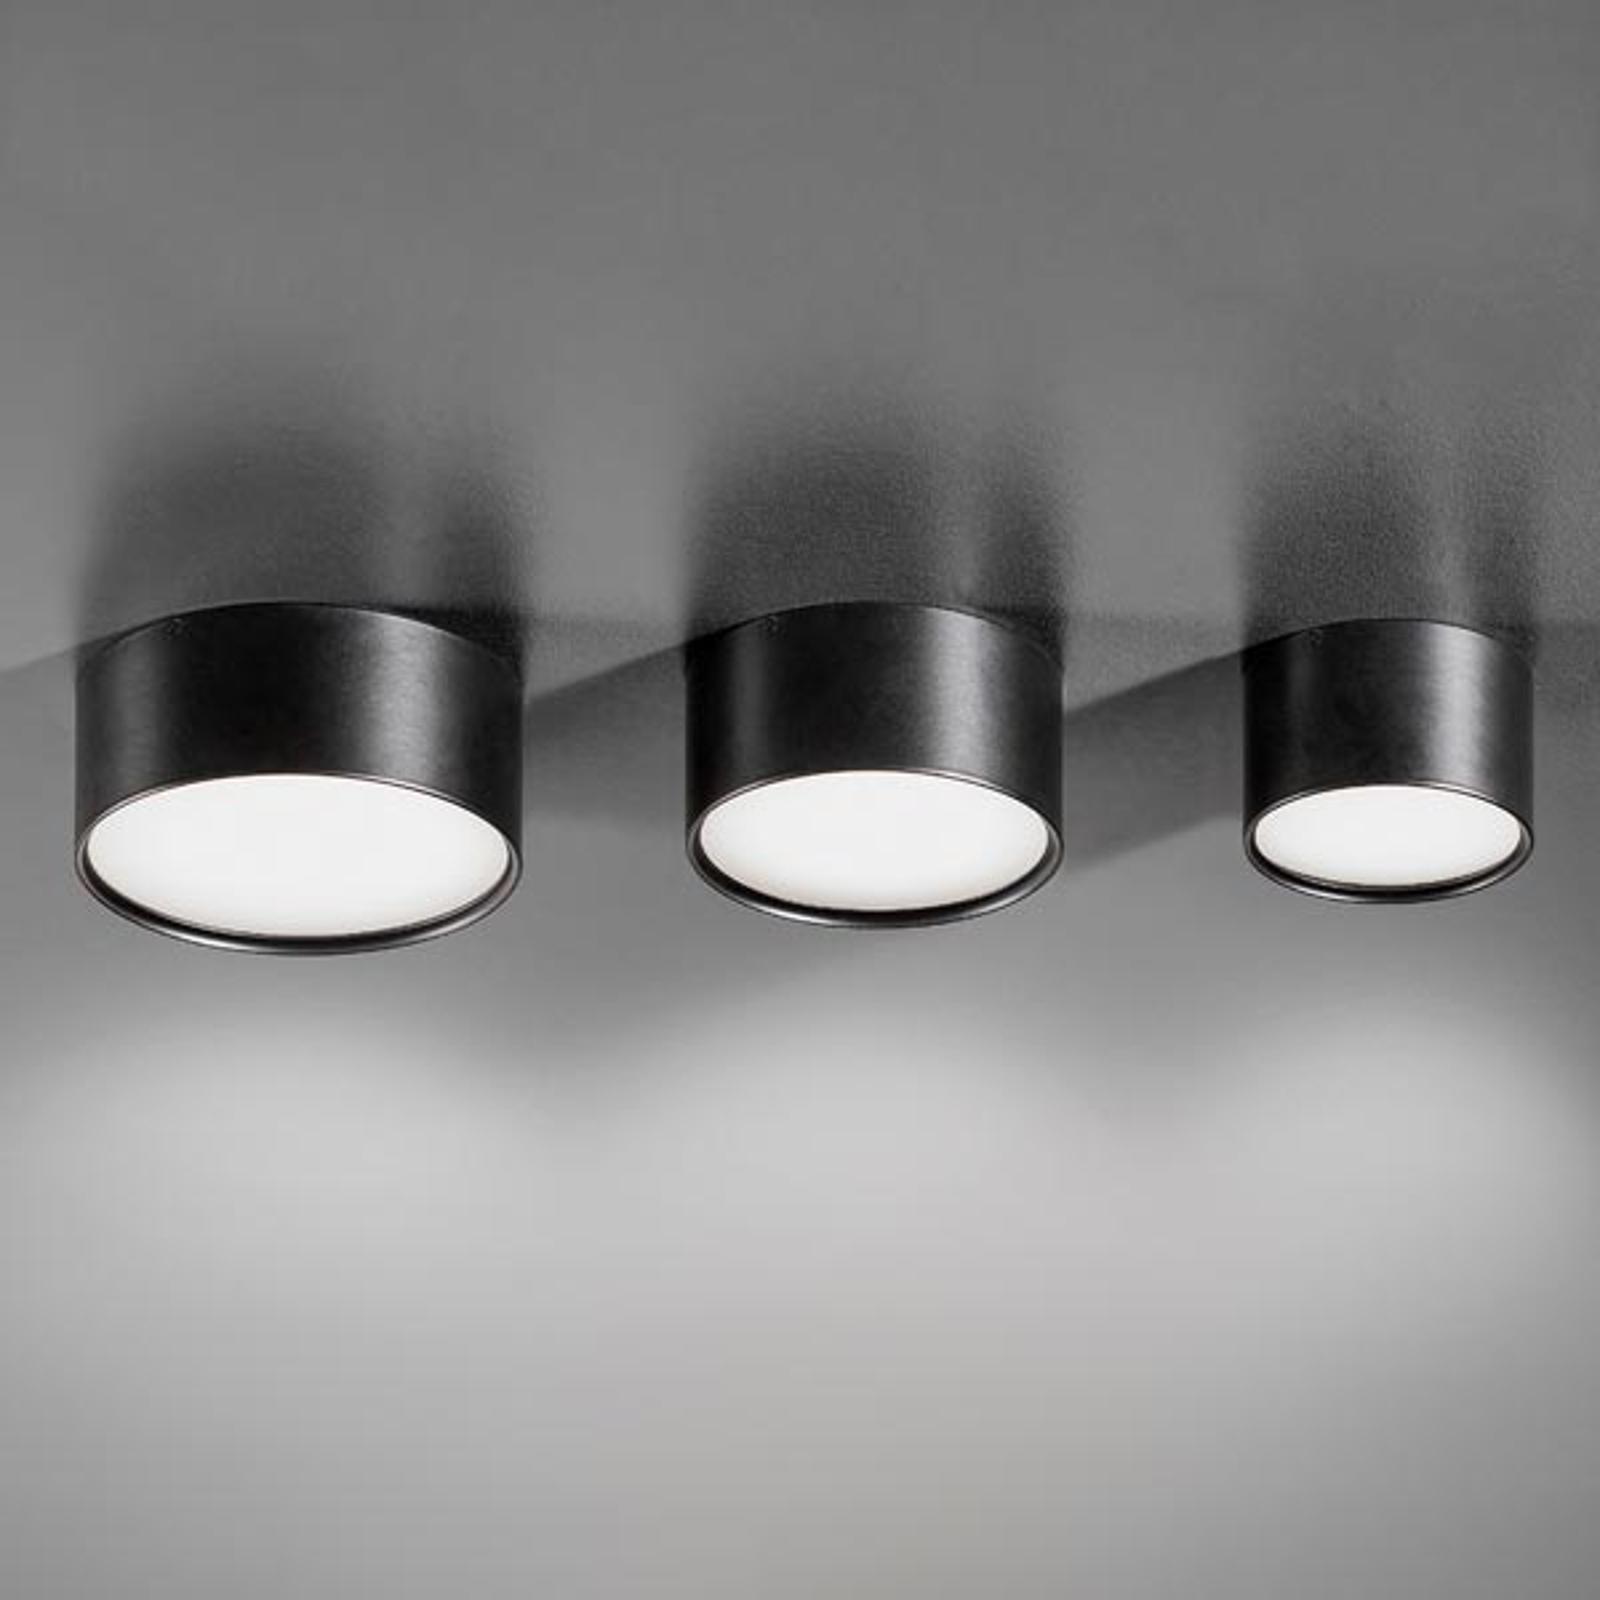 Plafonnier LED Mine simple, noir 14cm